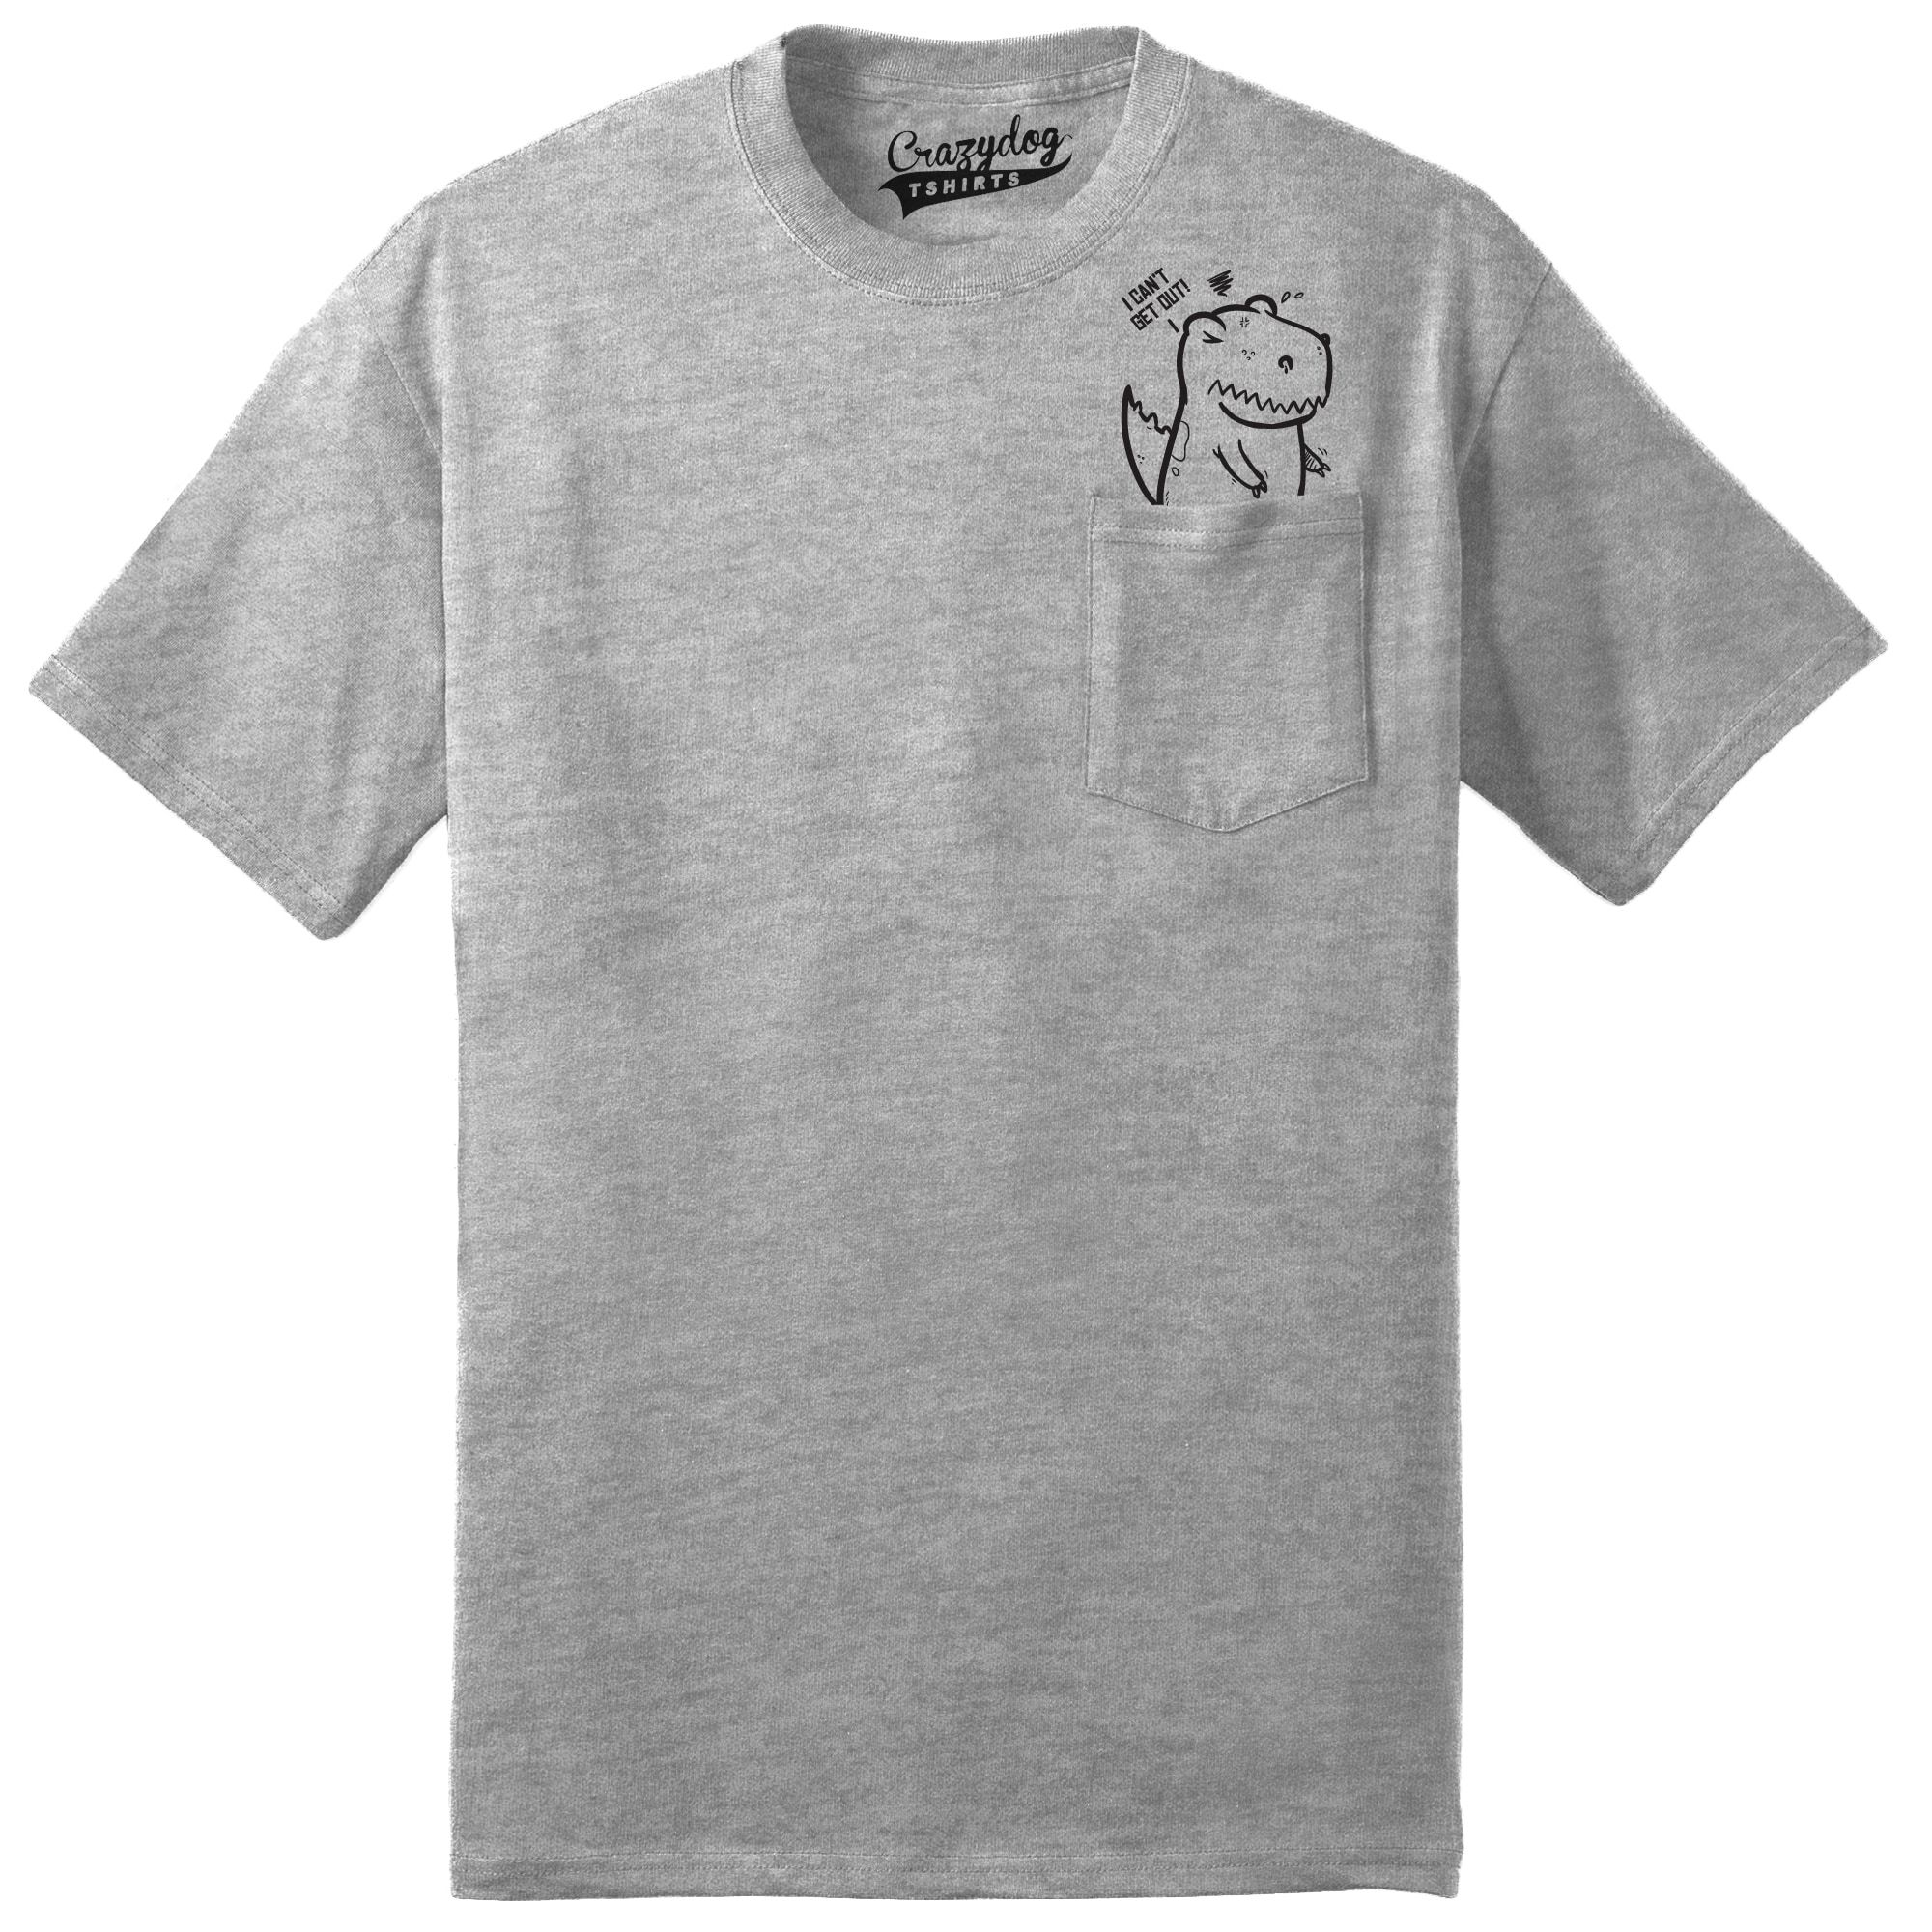 735726d522a7 Mens Pocket T rex Funny Dinosaur Peeking T shirt | ∆ style ∆ | Pug ...